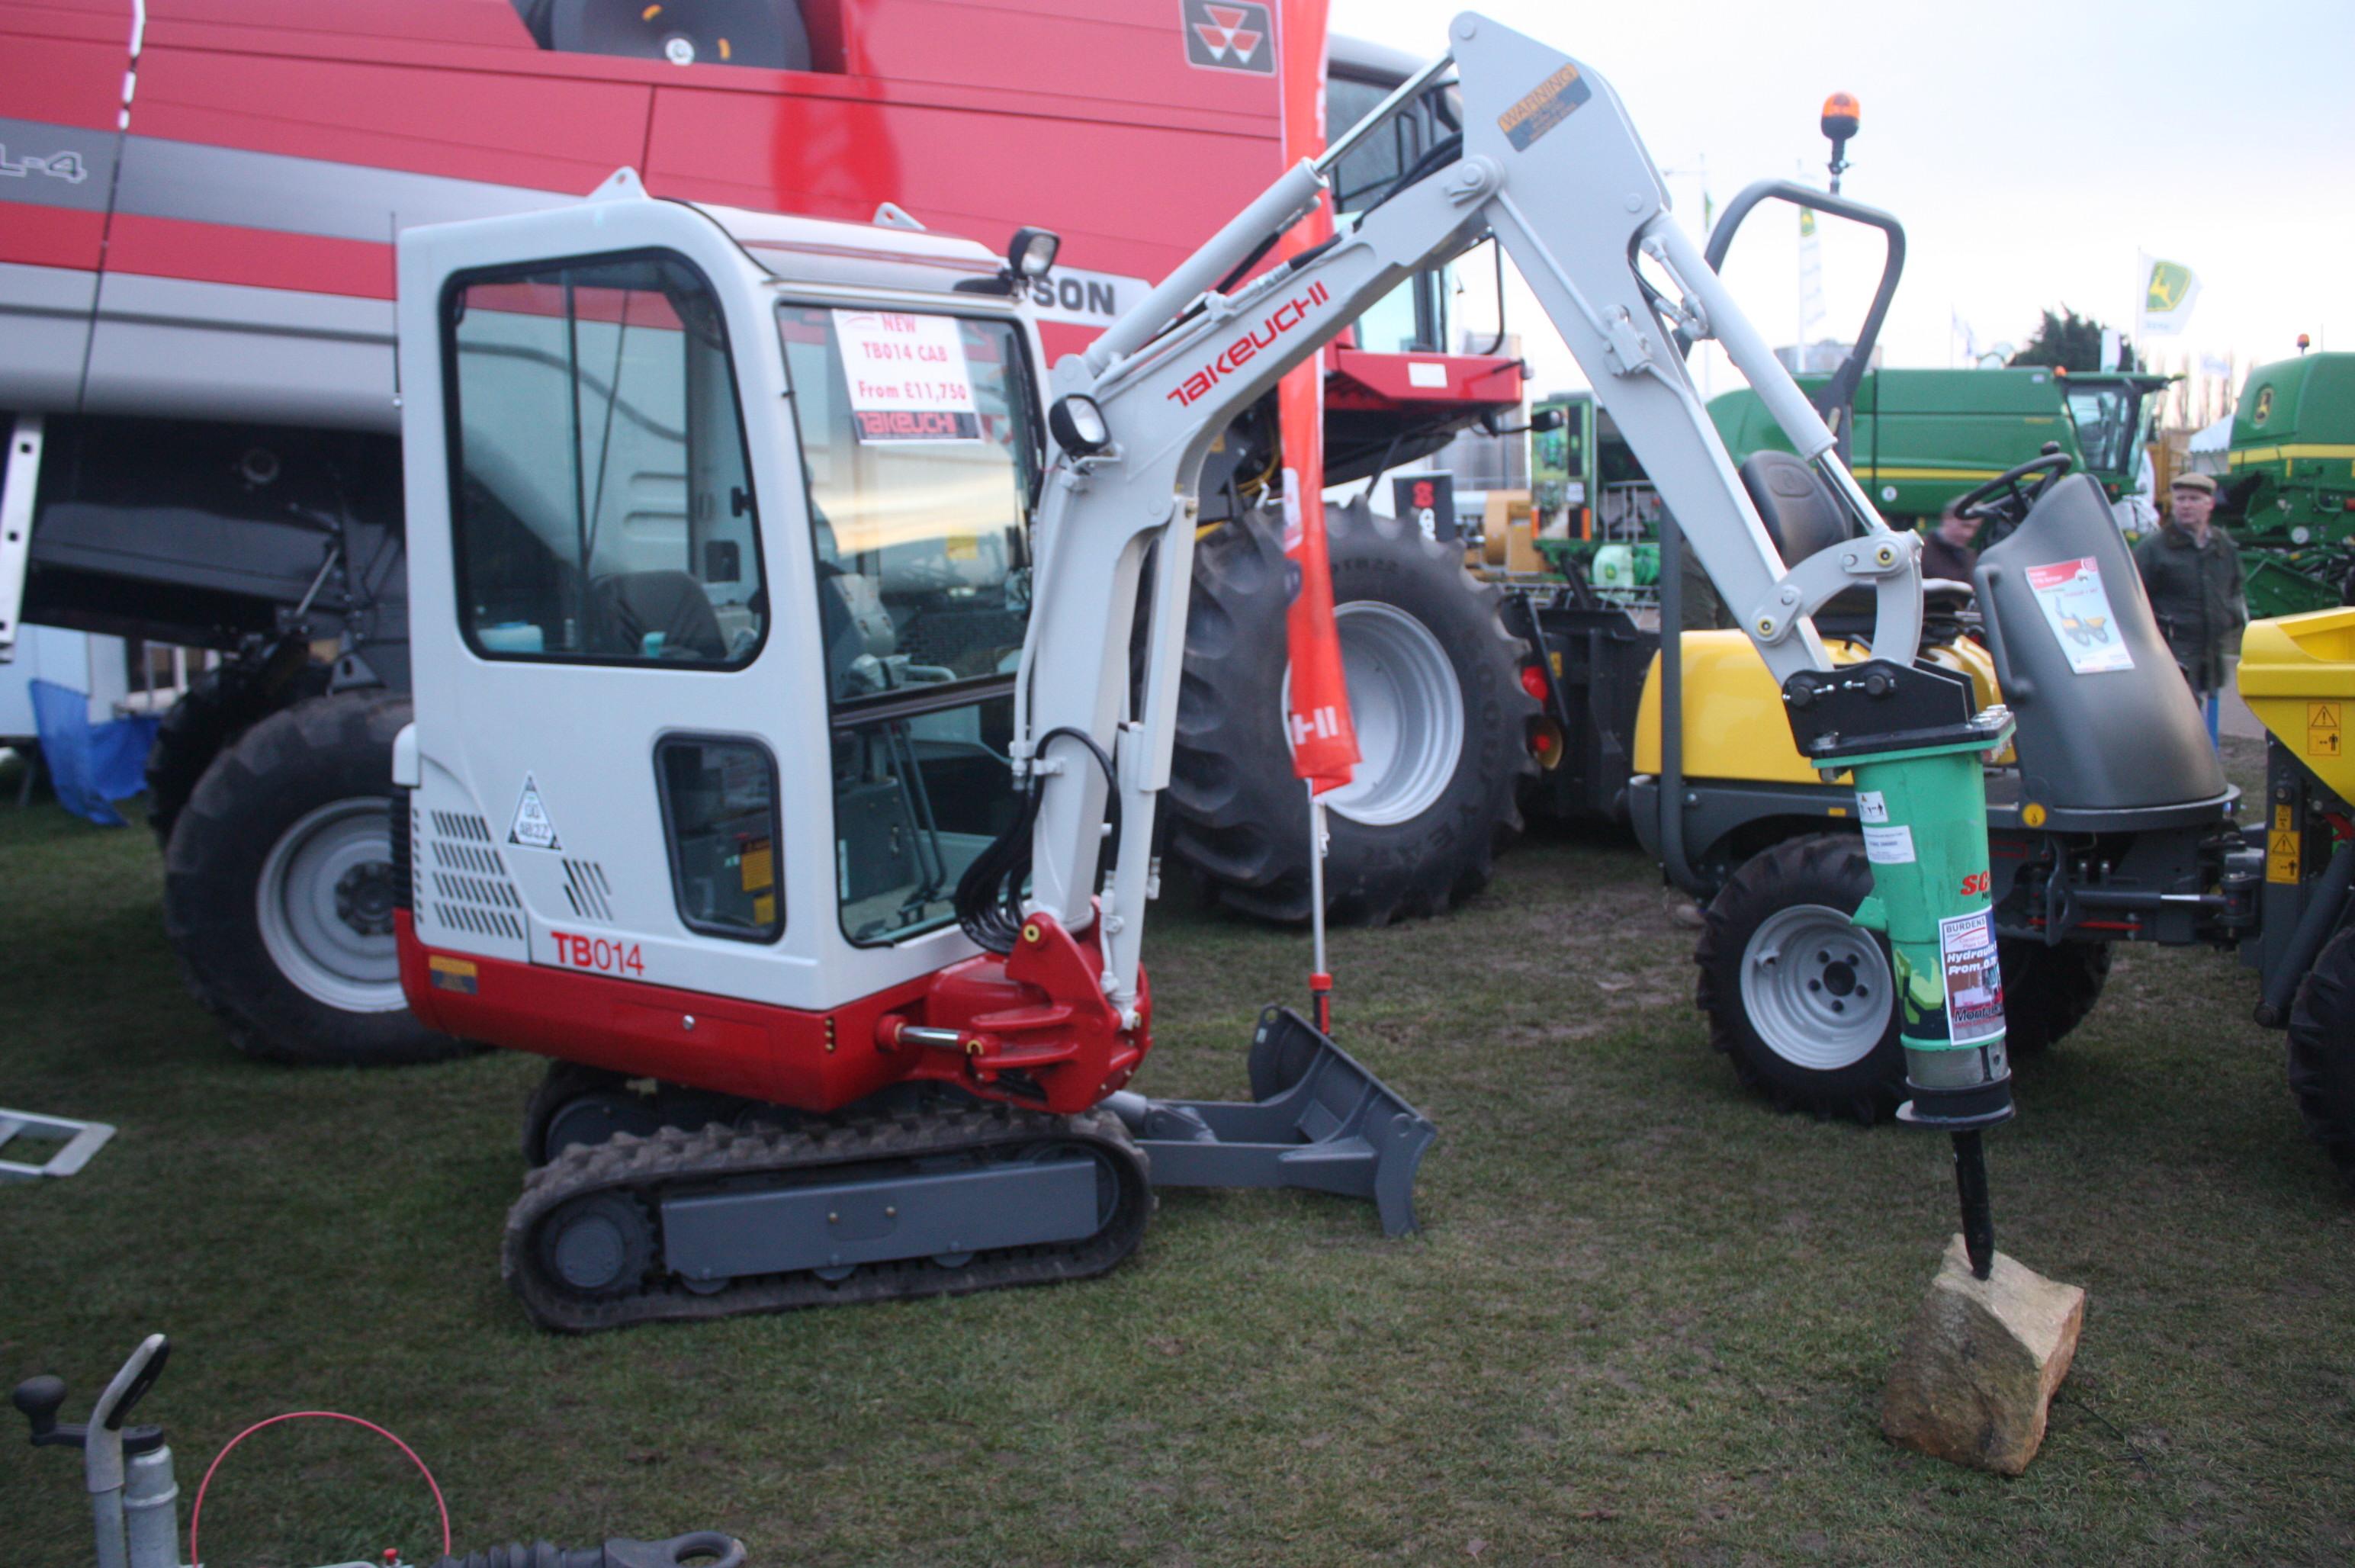 takeuchi tractor construction plant wiki fandom powered by wikia takeuchi tb014 mini digger breaker 4758